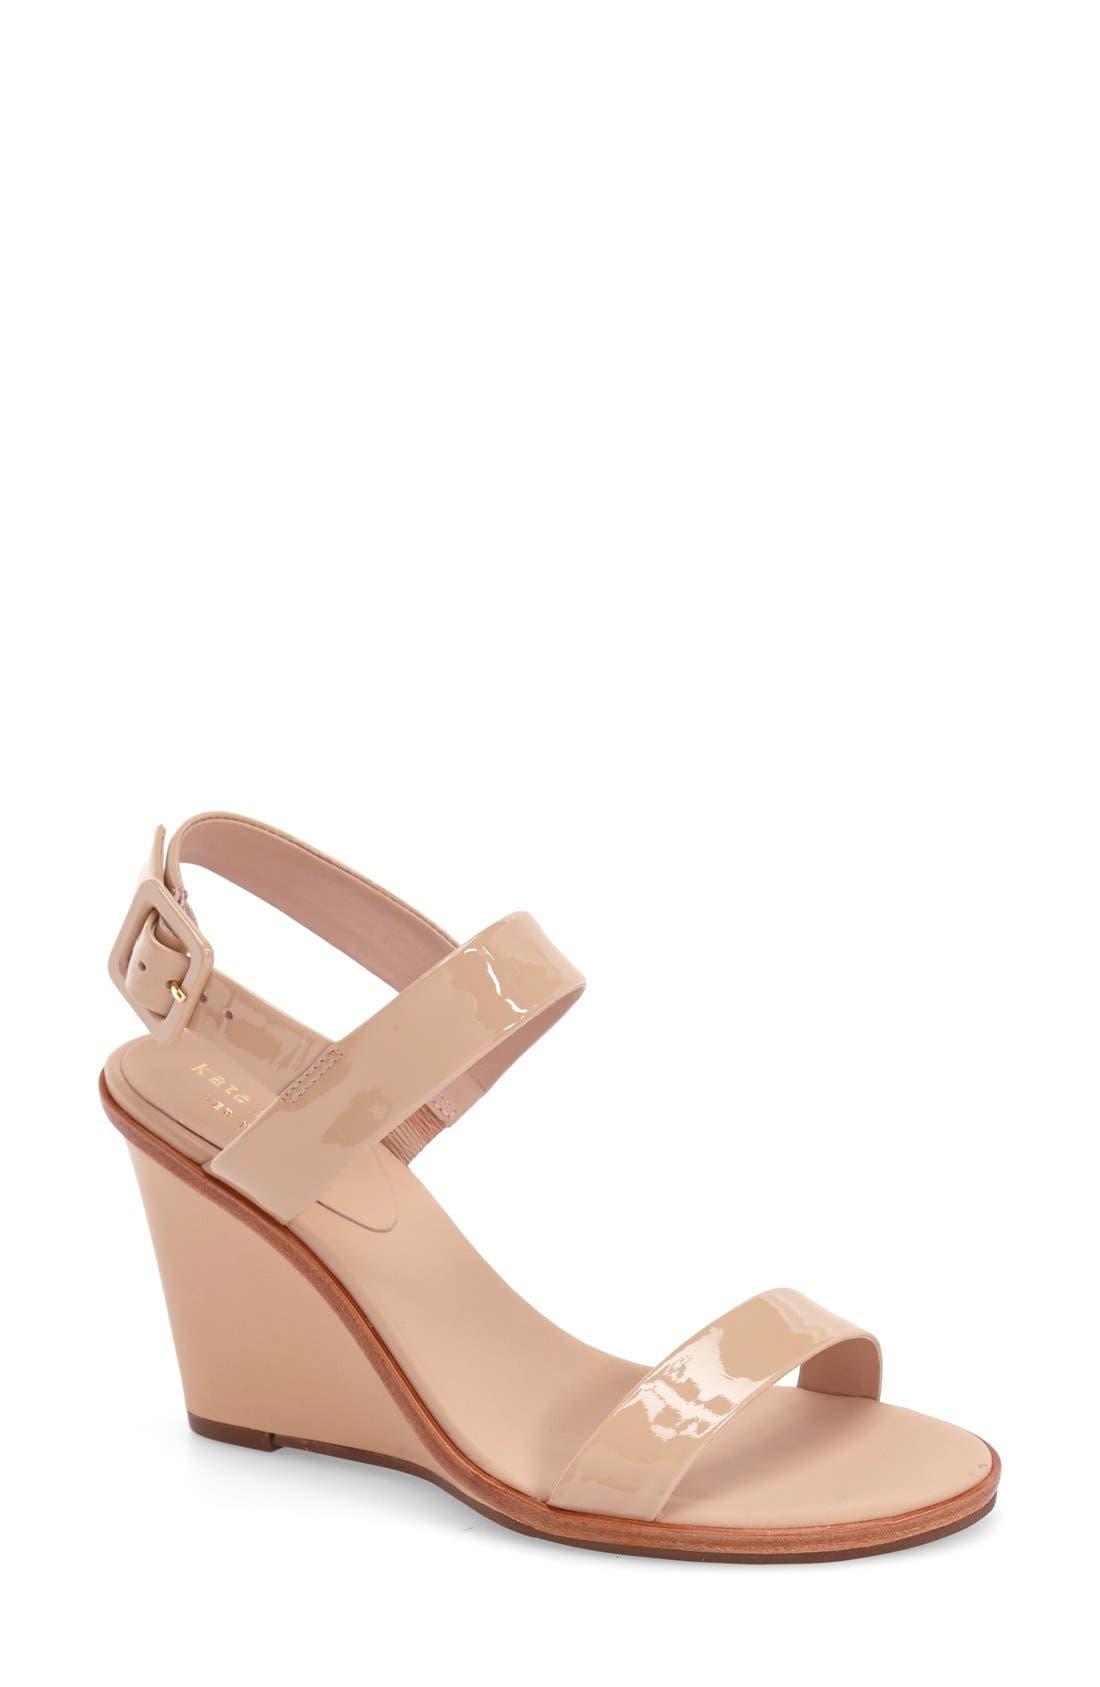 Alternate Image 1 Selected - kate spade new york 'nice' sandal (Women)